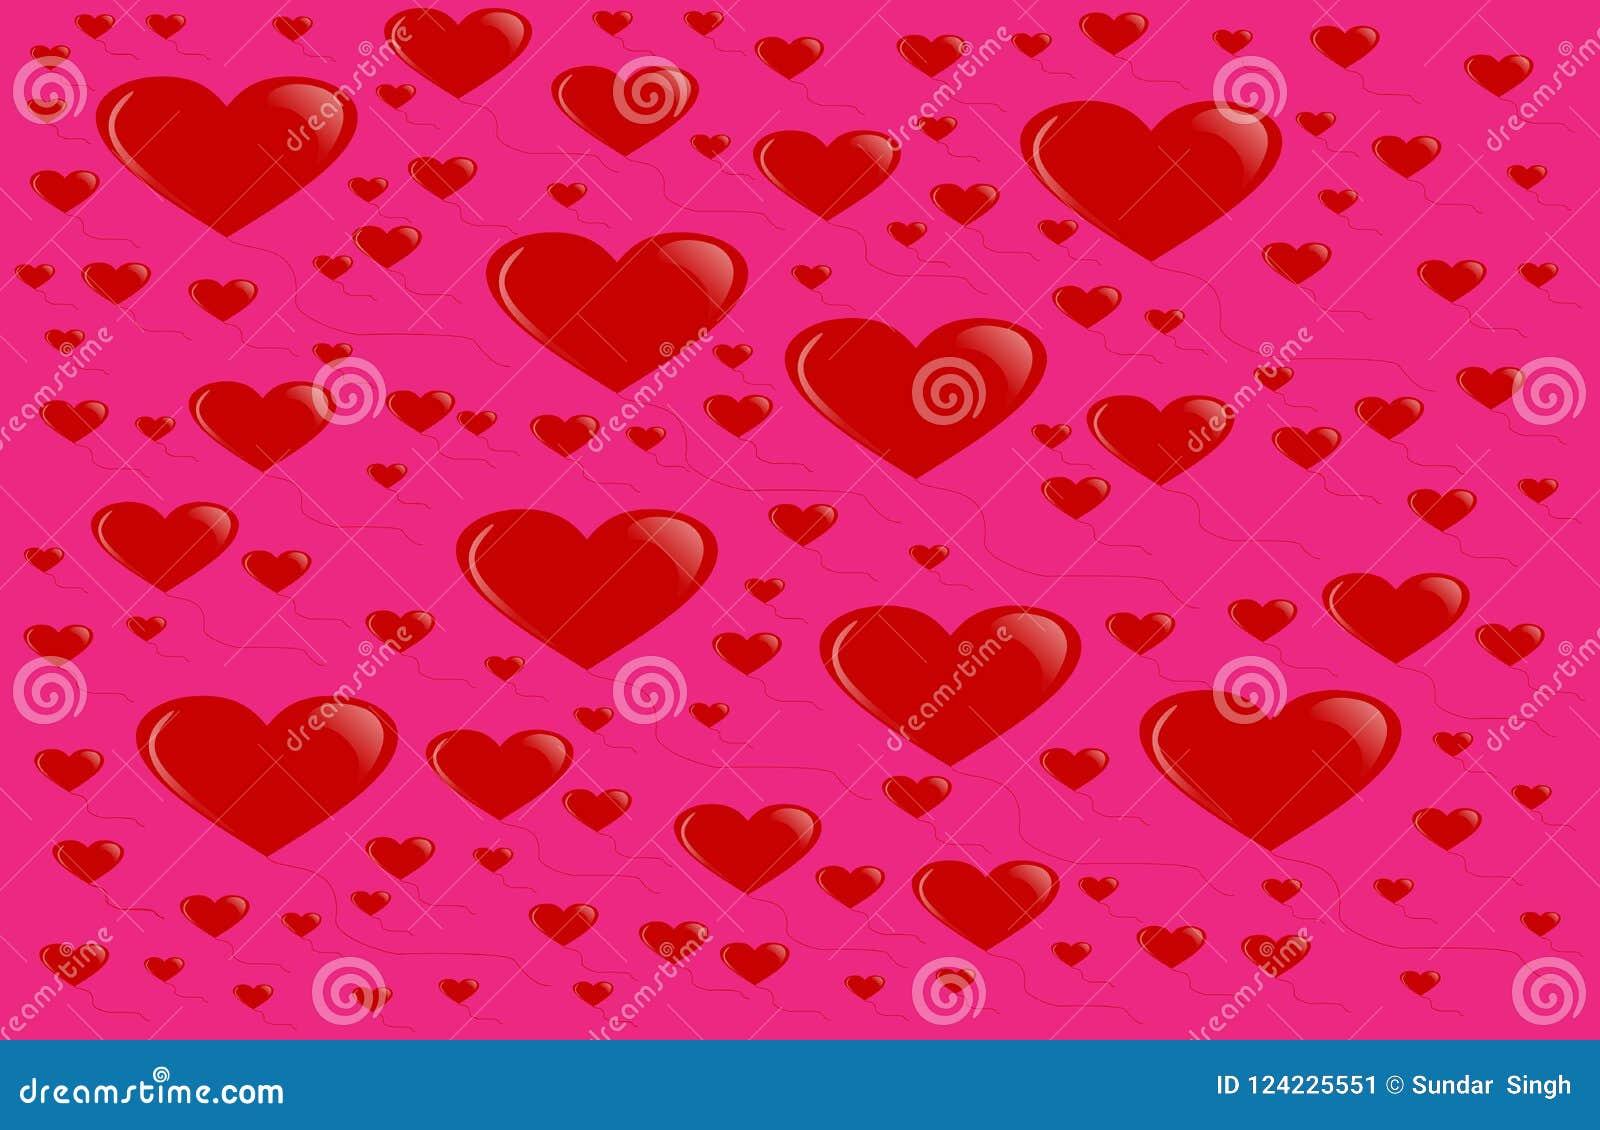 Valentines Day Background Love Romantic Theme Monochrome Repeat